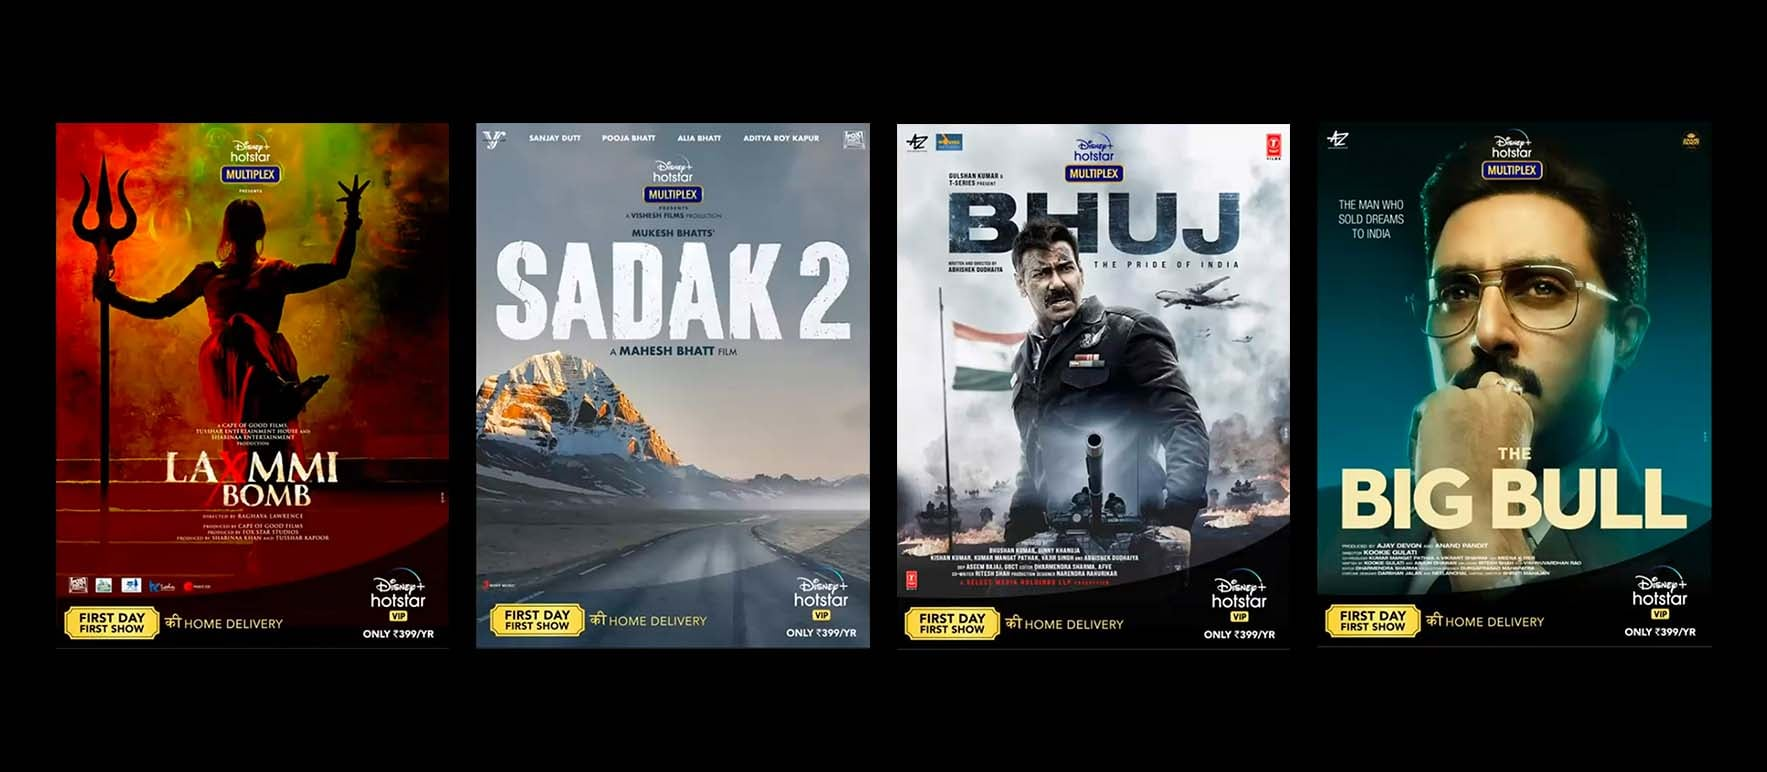 Bhuj, Laxmmi Bomb, Sadak 2, Three Other Bollywood Movies Head to Disney+ Hotstar